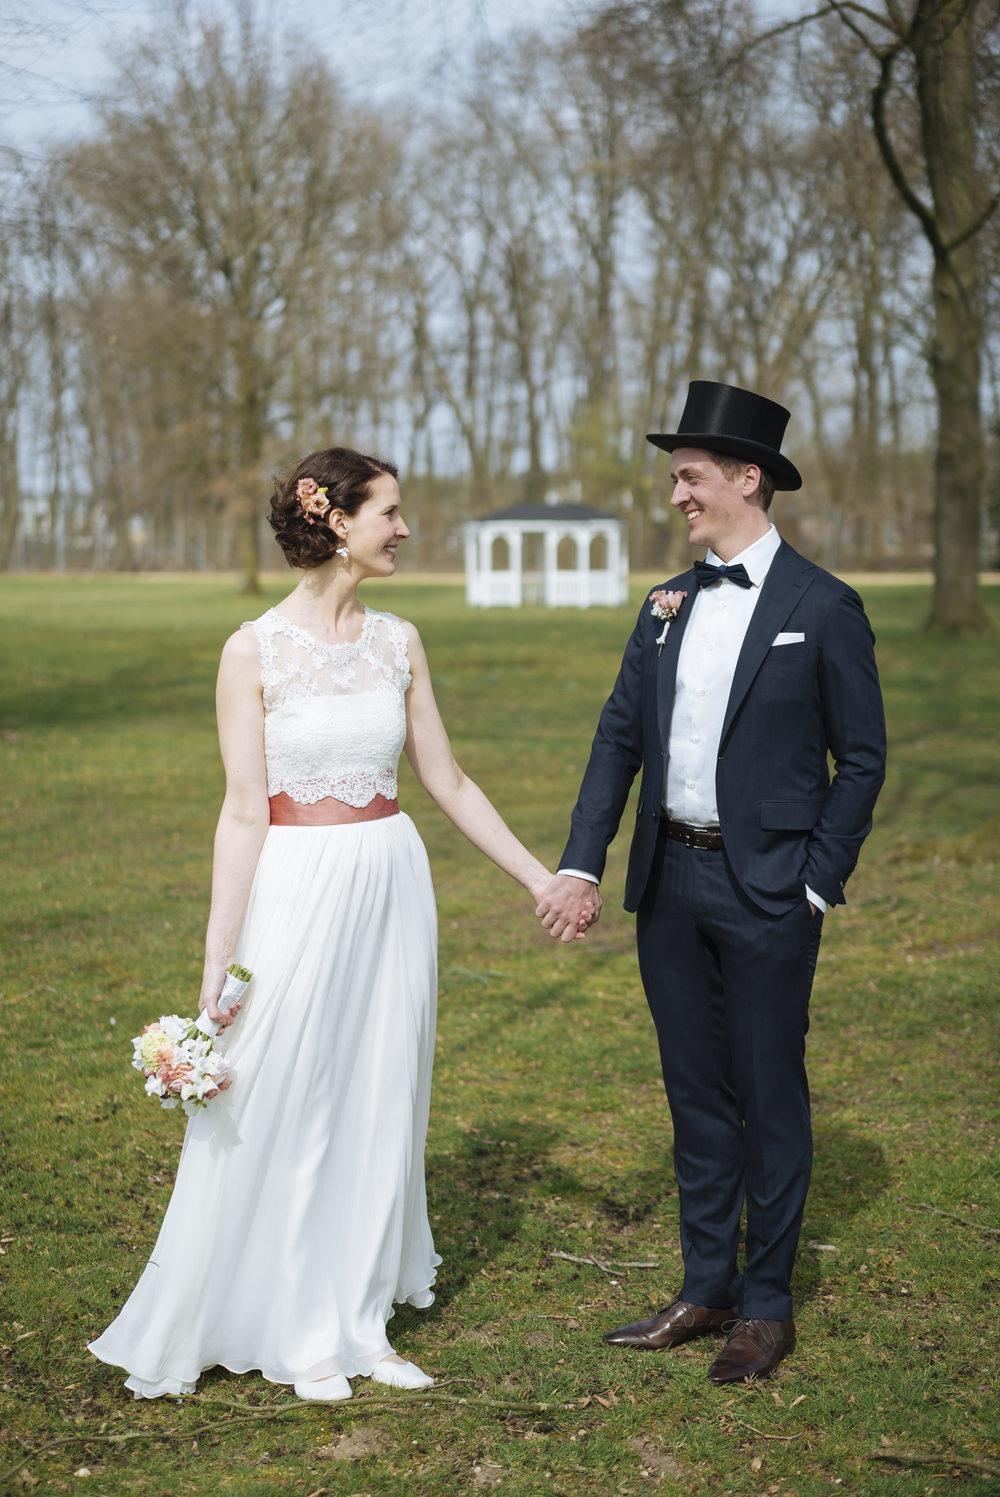 Hochzeitsfotograf-Schlossruine-Hertefeld-Weeze-045.jpg